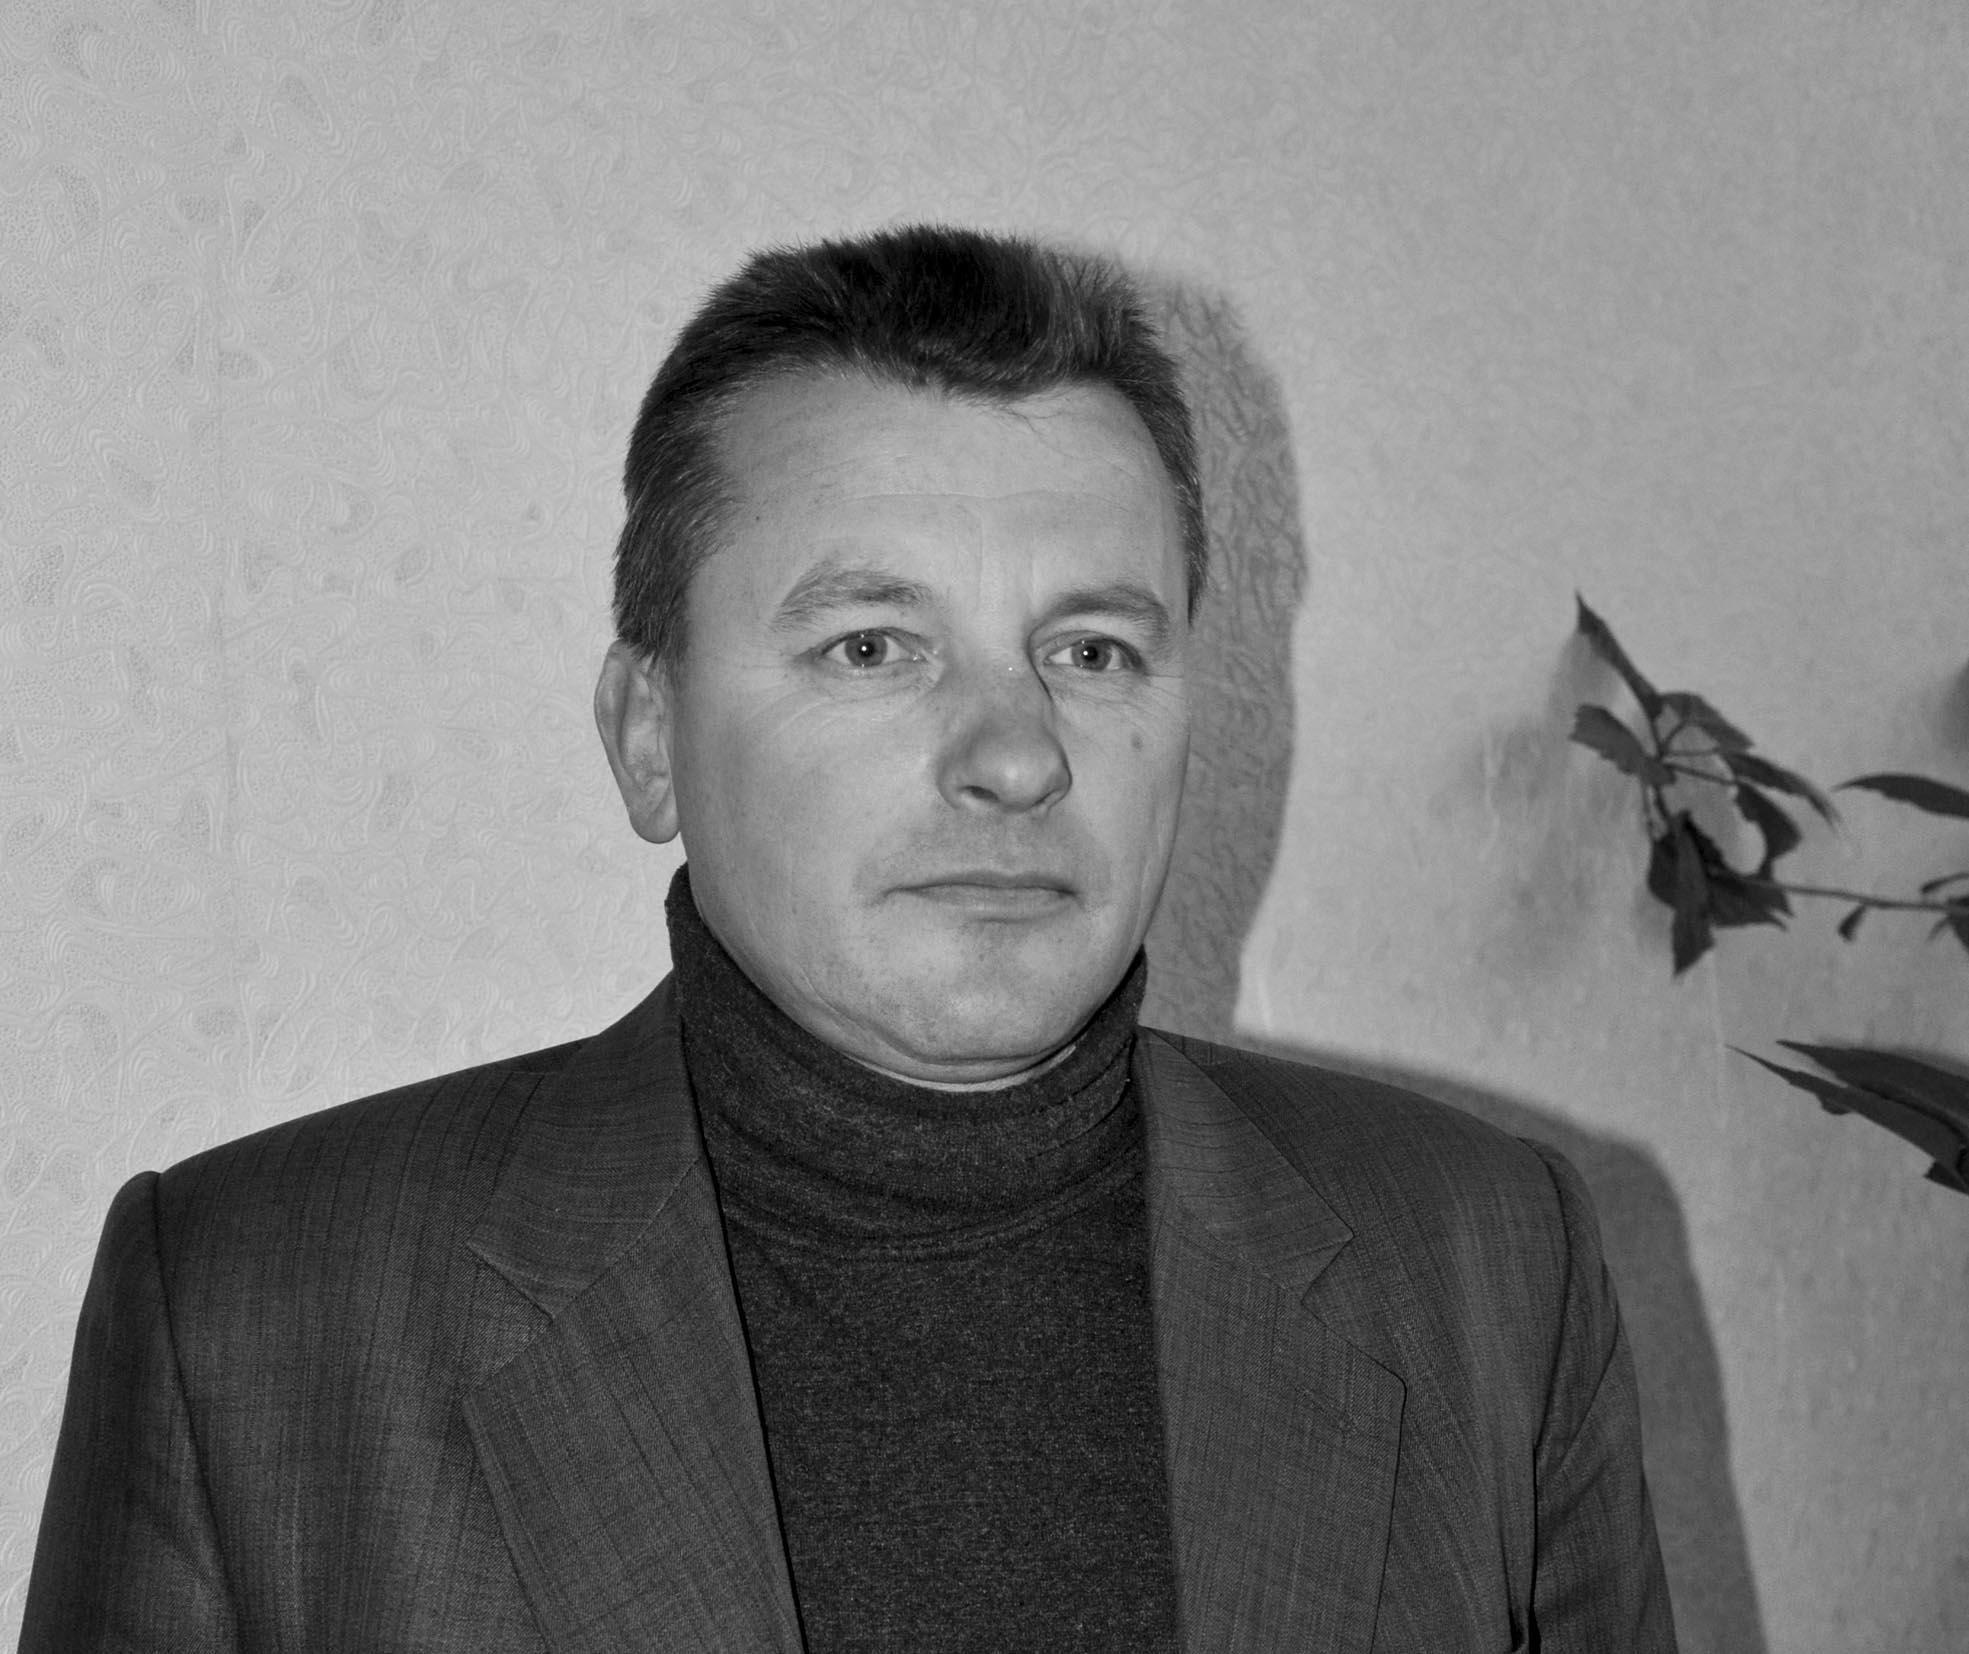 михайло-оліферчук